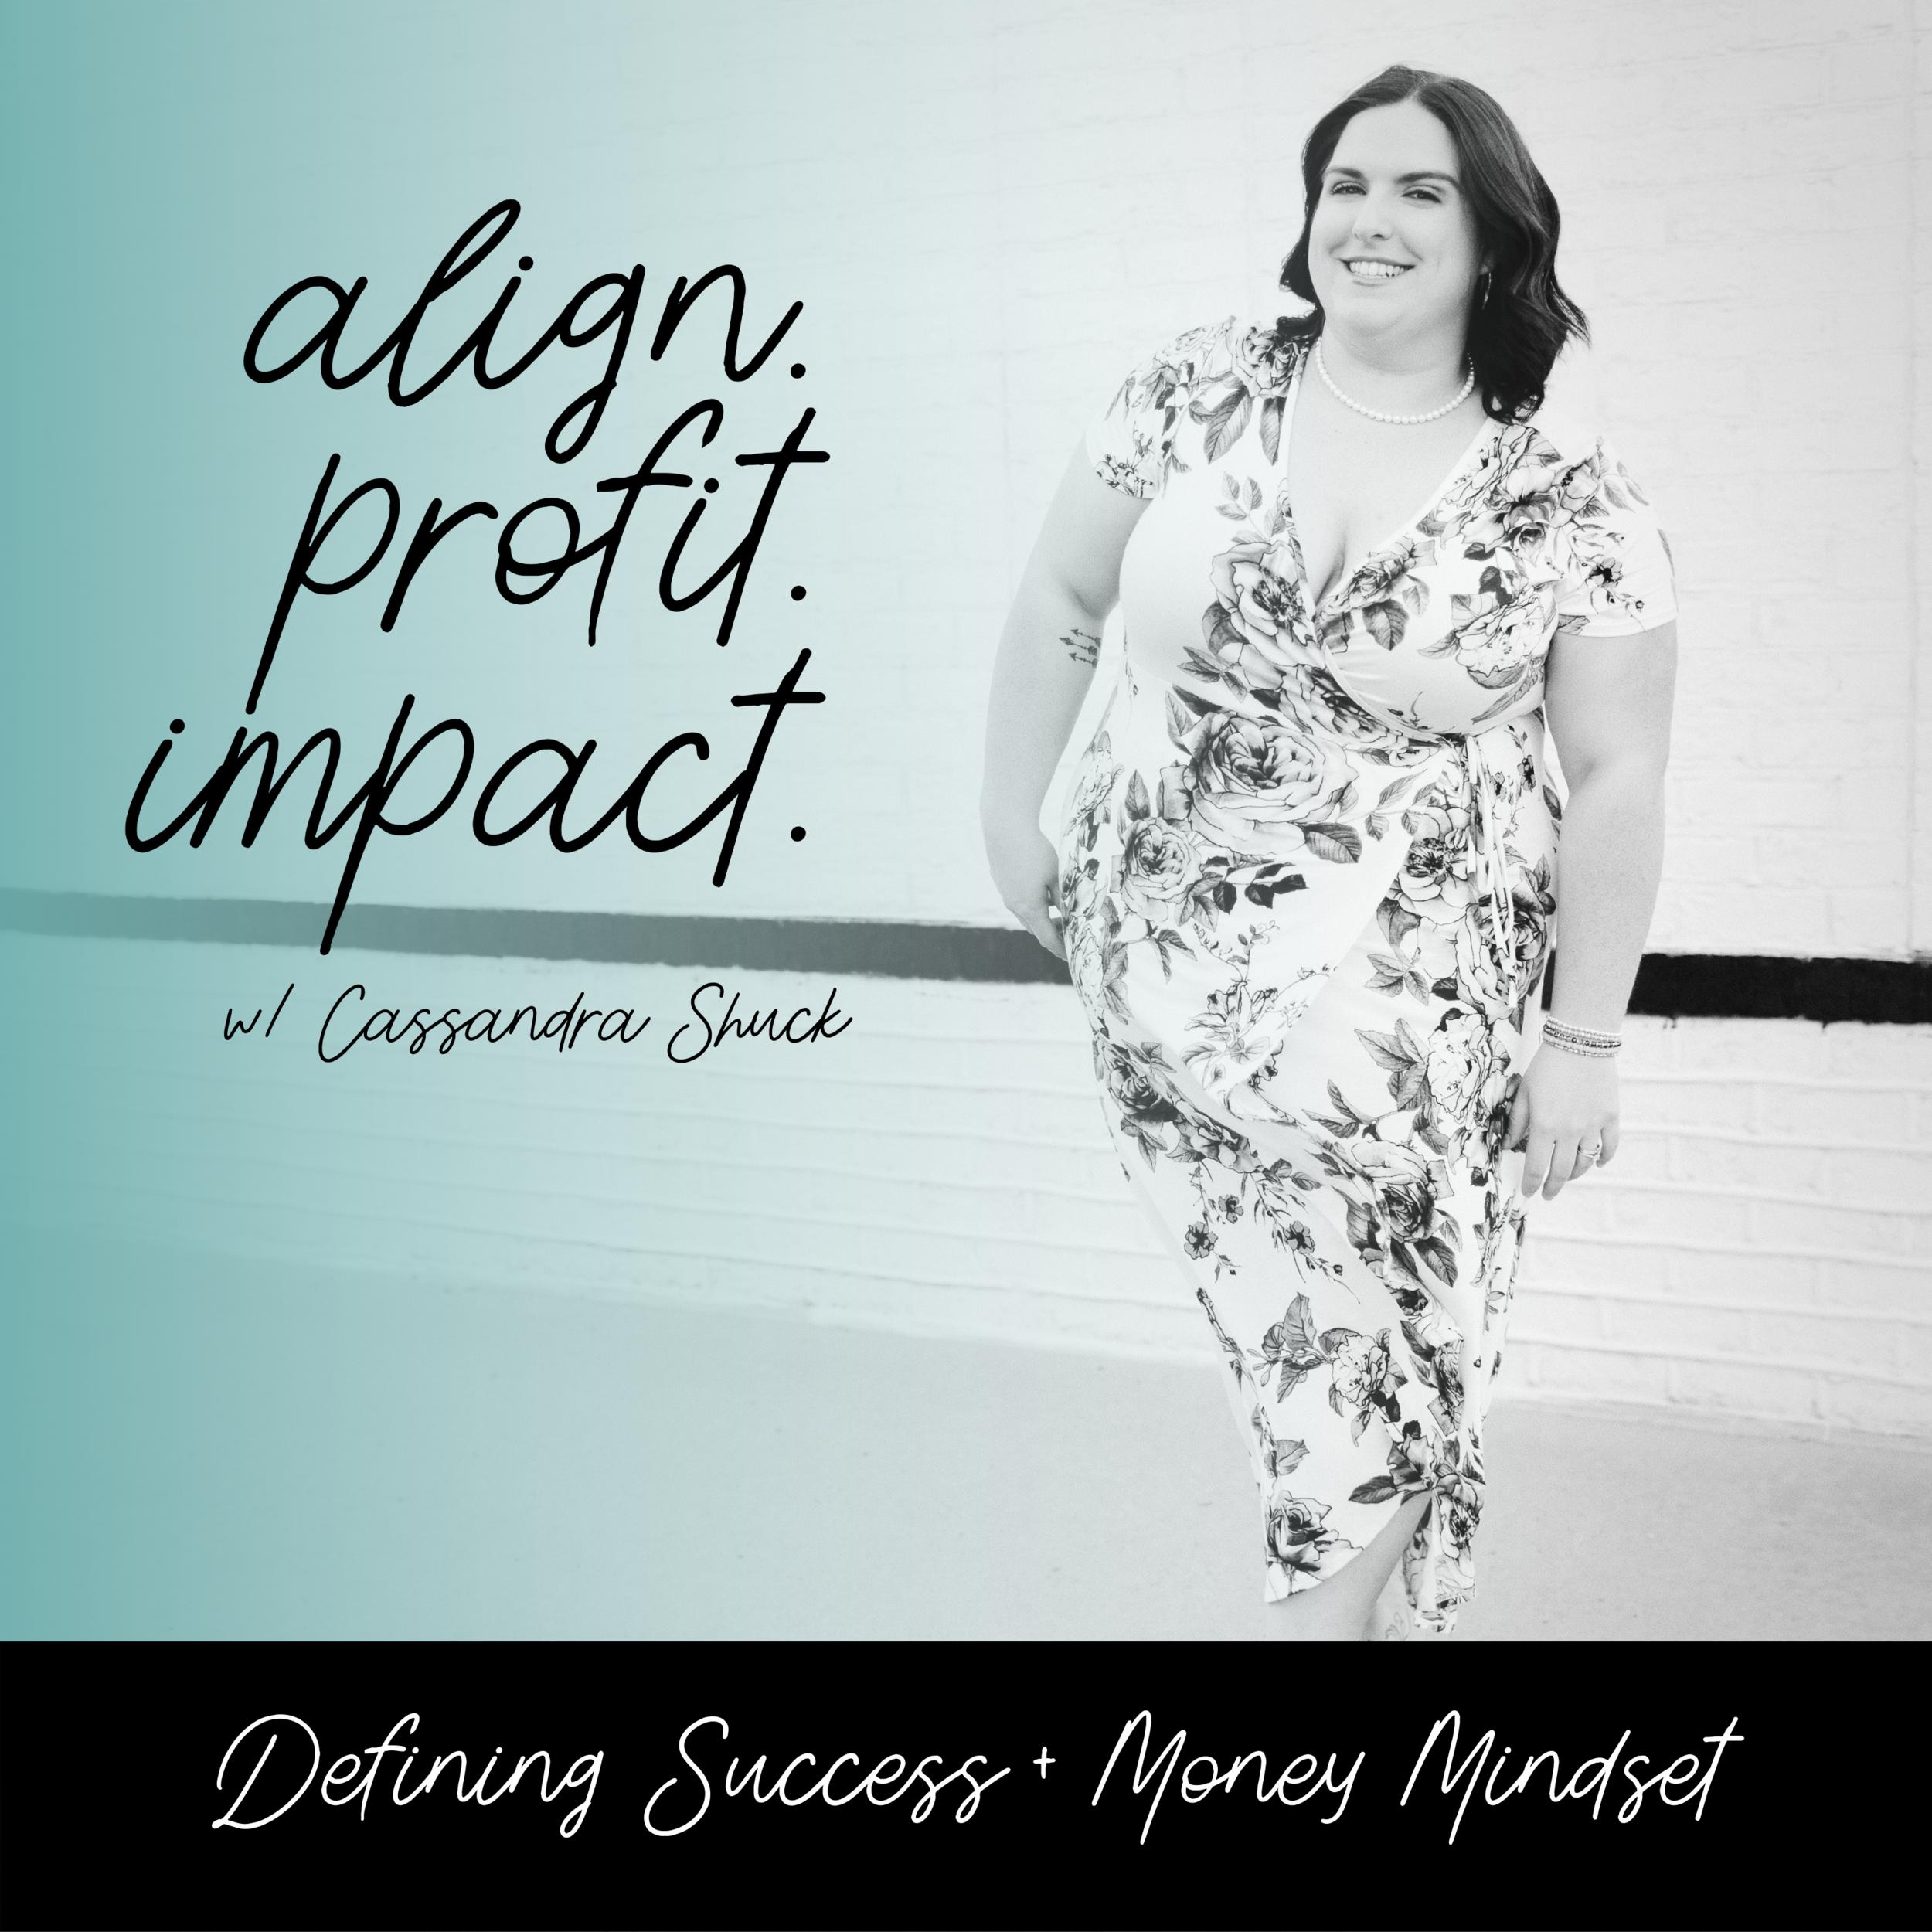 defining success + money mindset.png